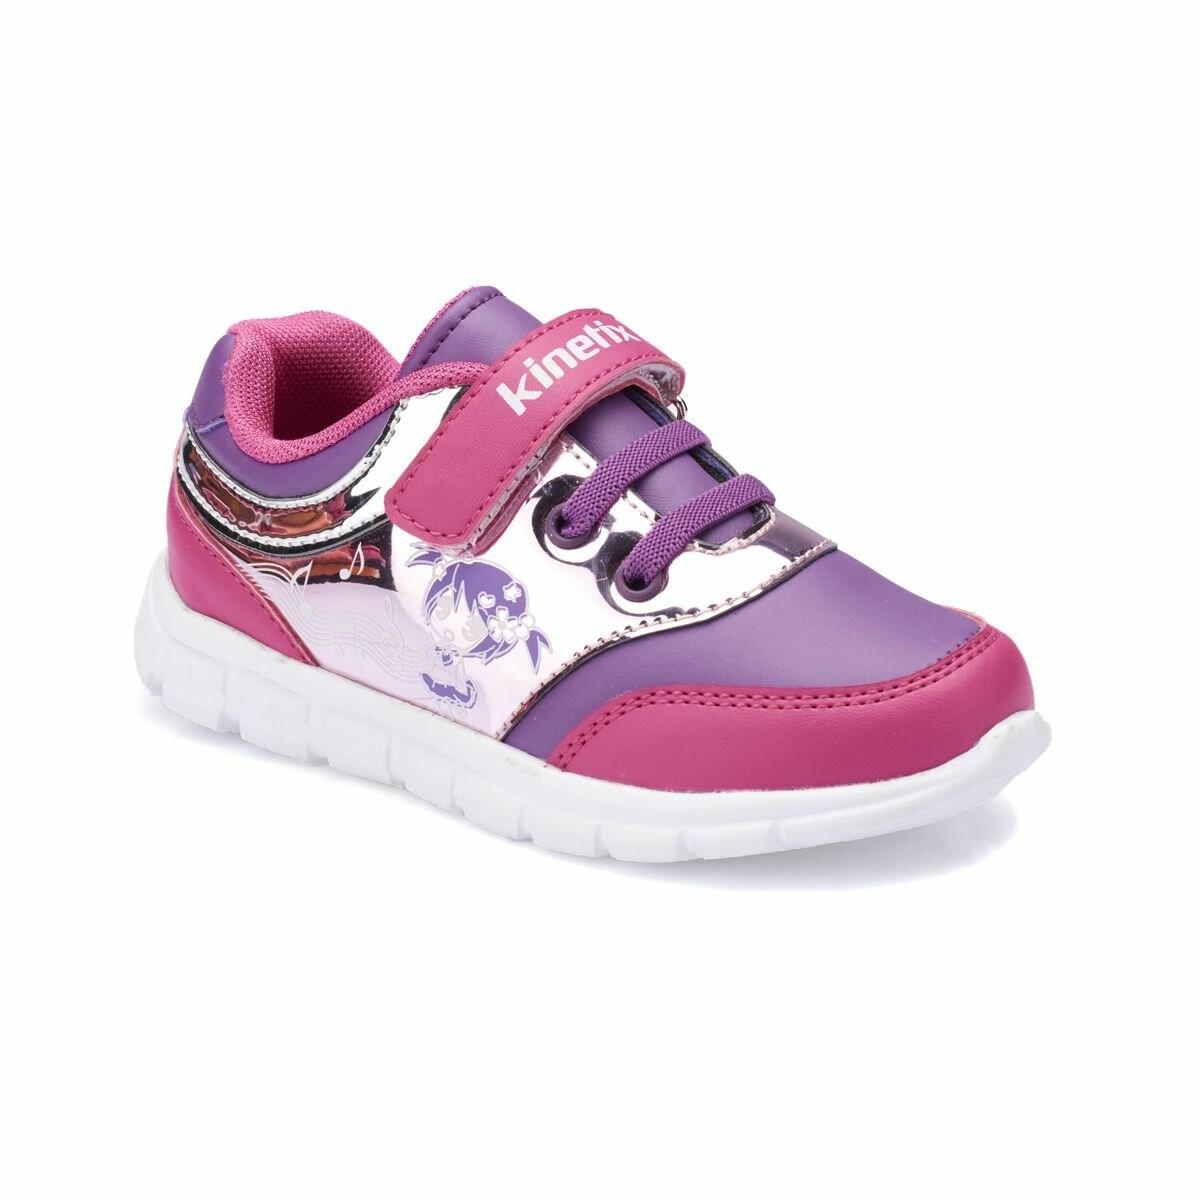 FLO KYLIE Purple Female Child Running Shoes KINETIX